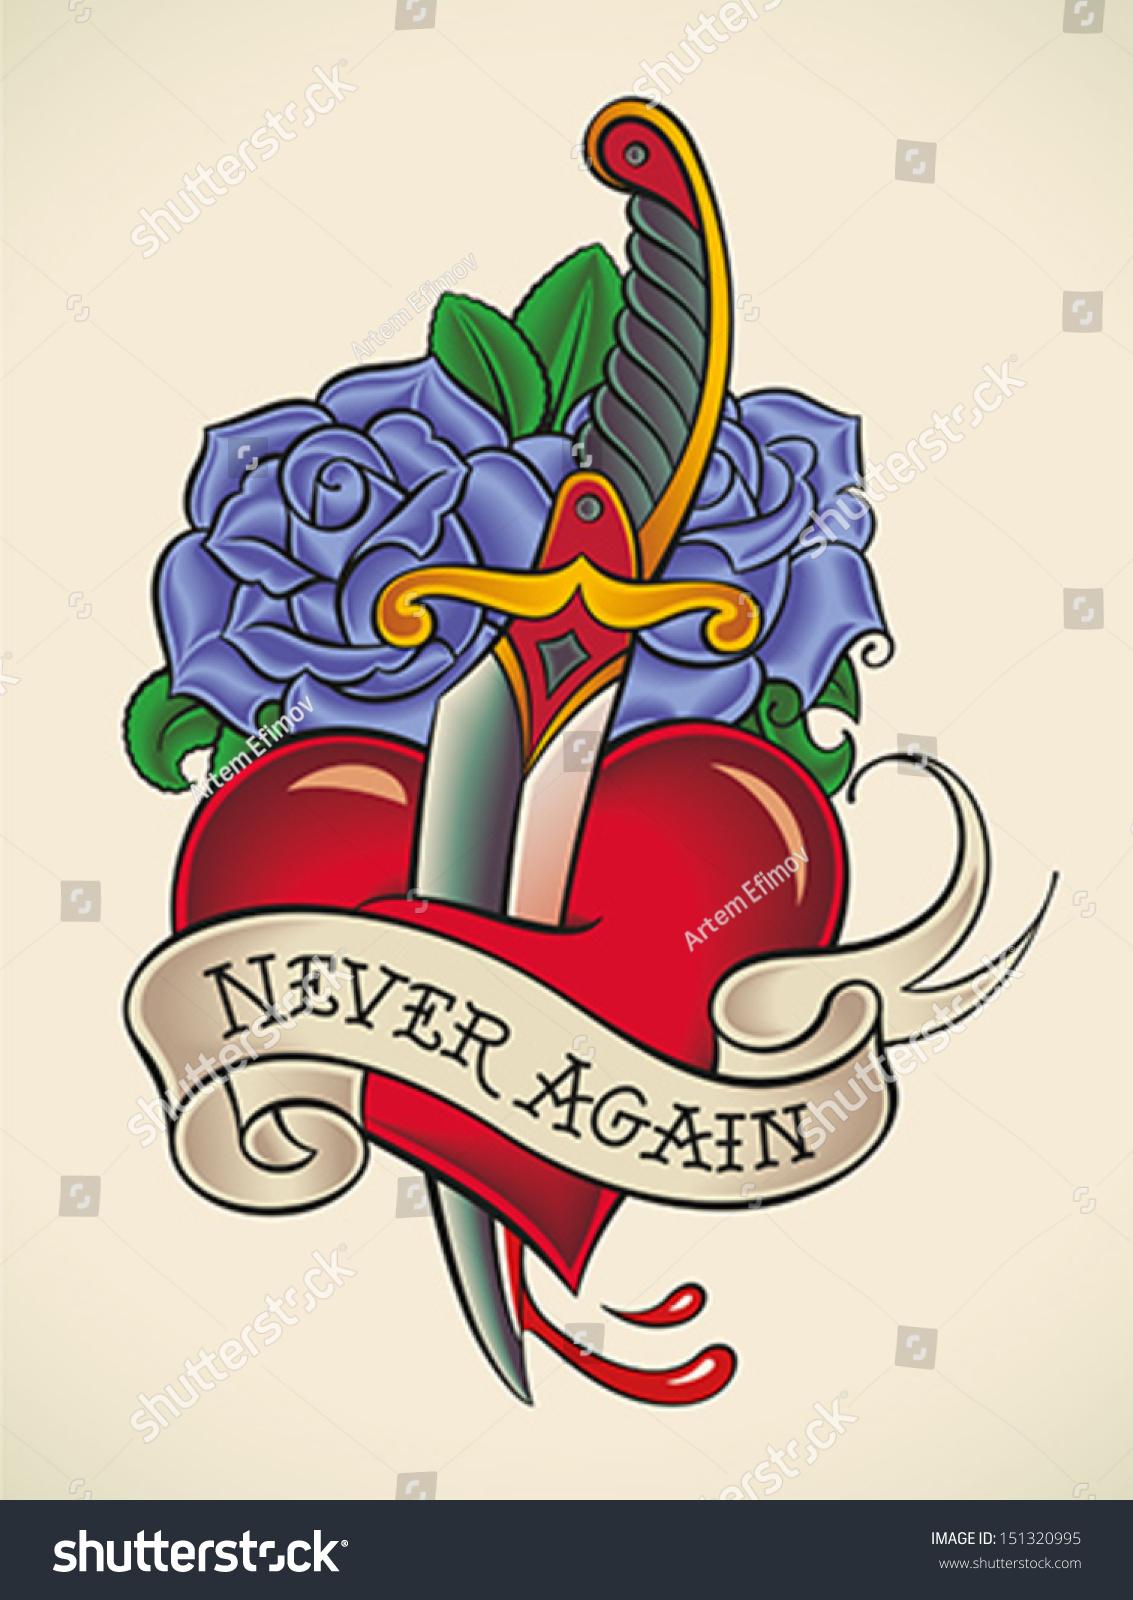 Heart with sword through it logo www imgkid com the